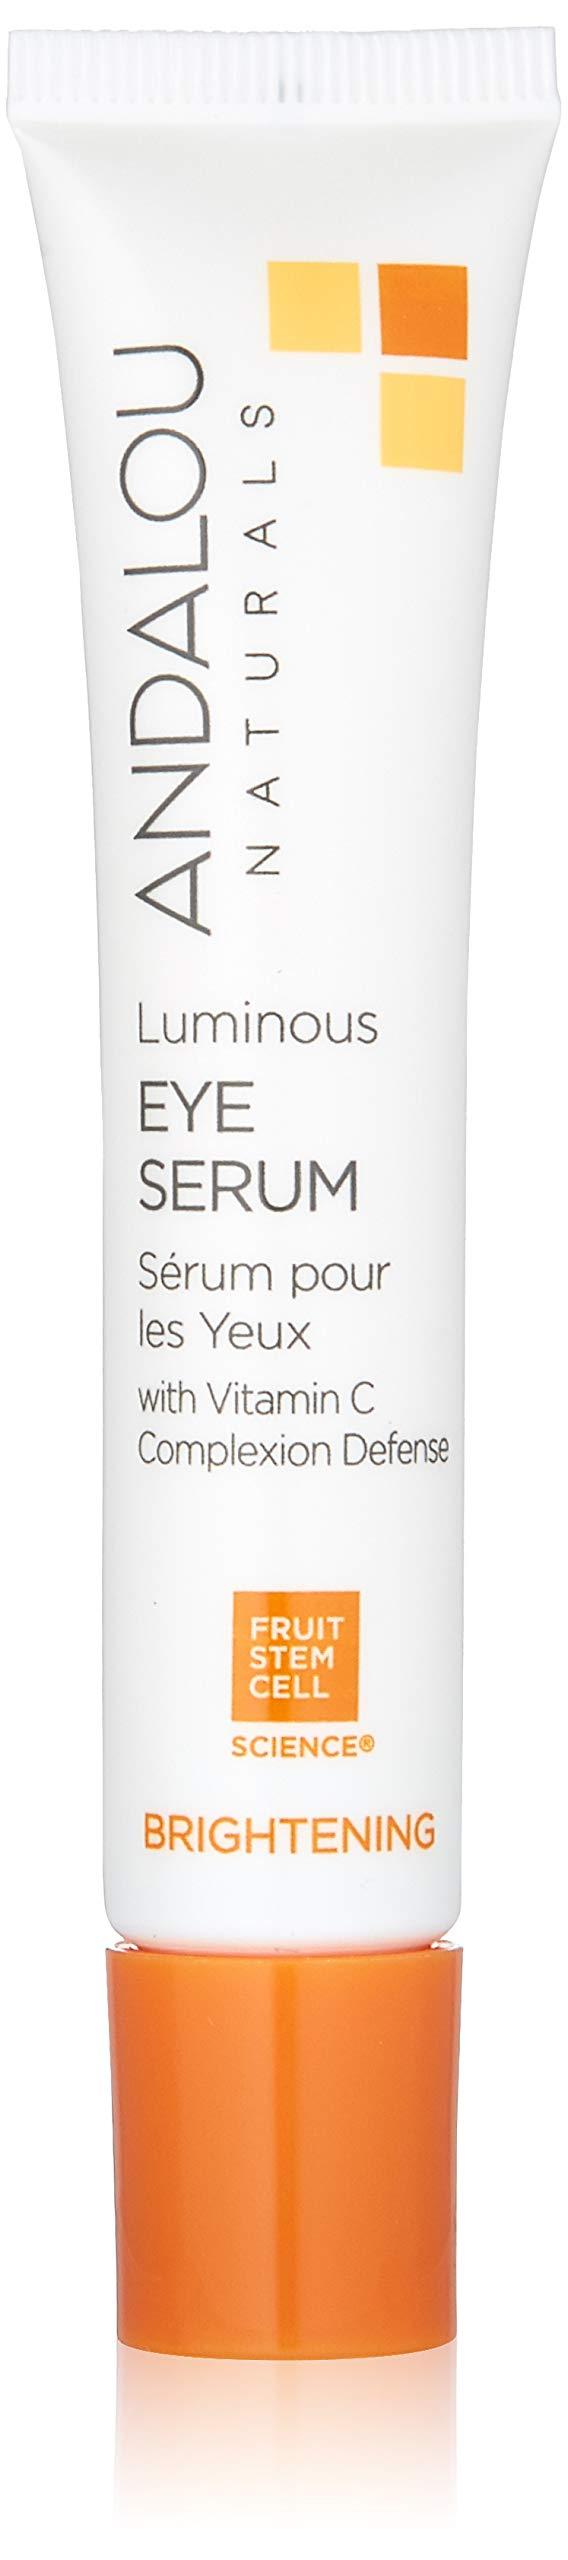 Andalou Naturals Luminous Eye Serum - 0.6 Oz